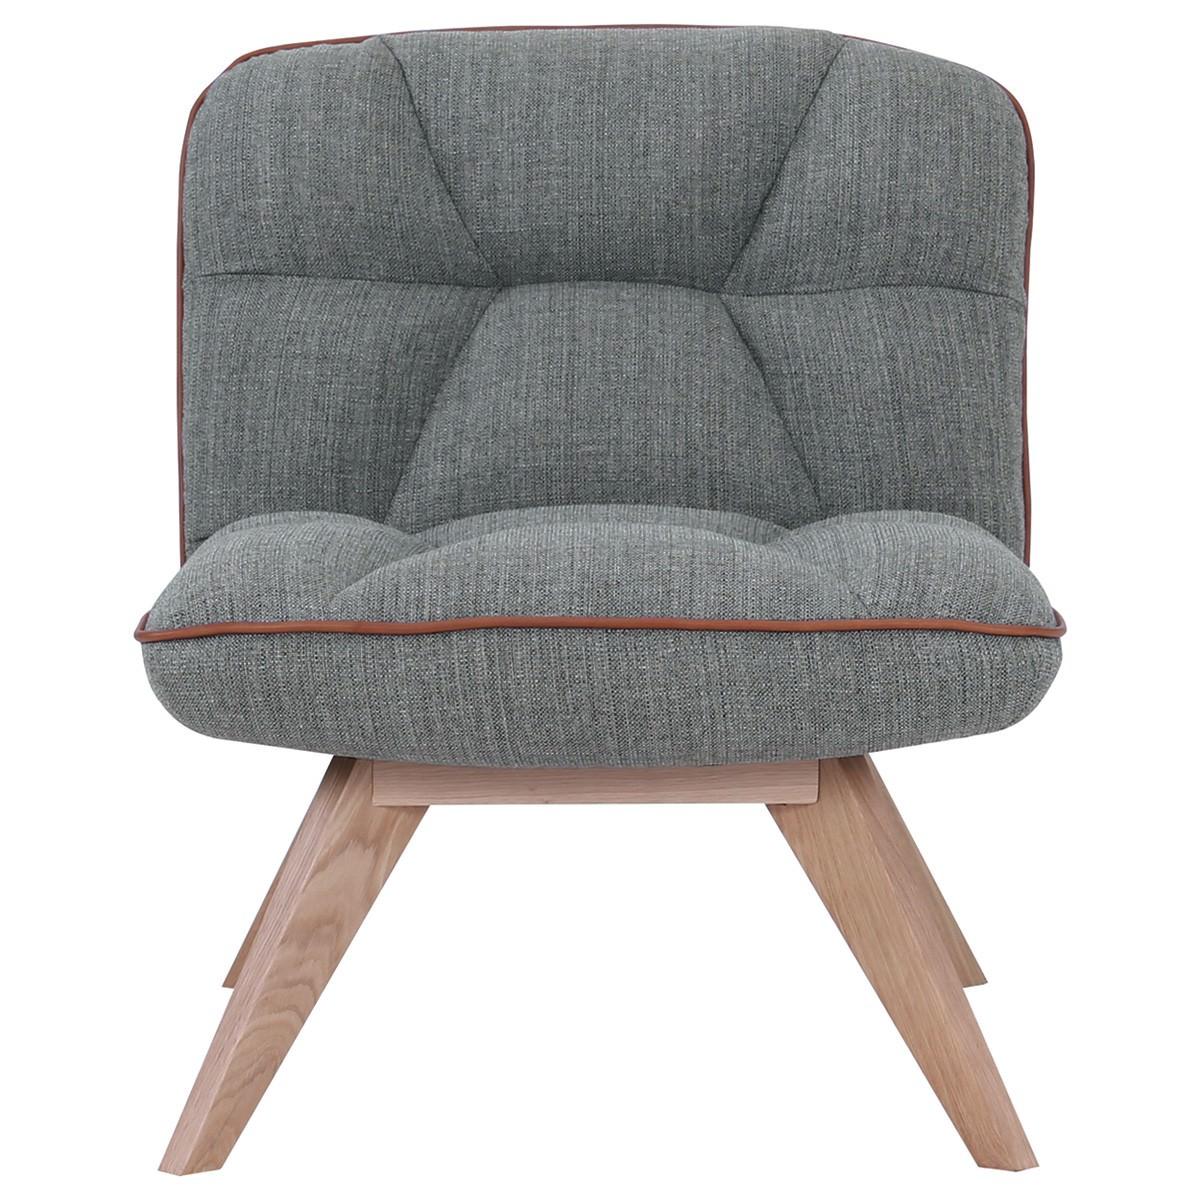 Feiro Commercial Grade Fabric Lounge Chair, Grey